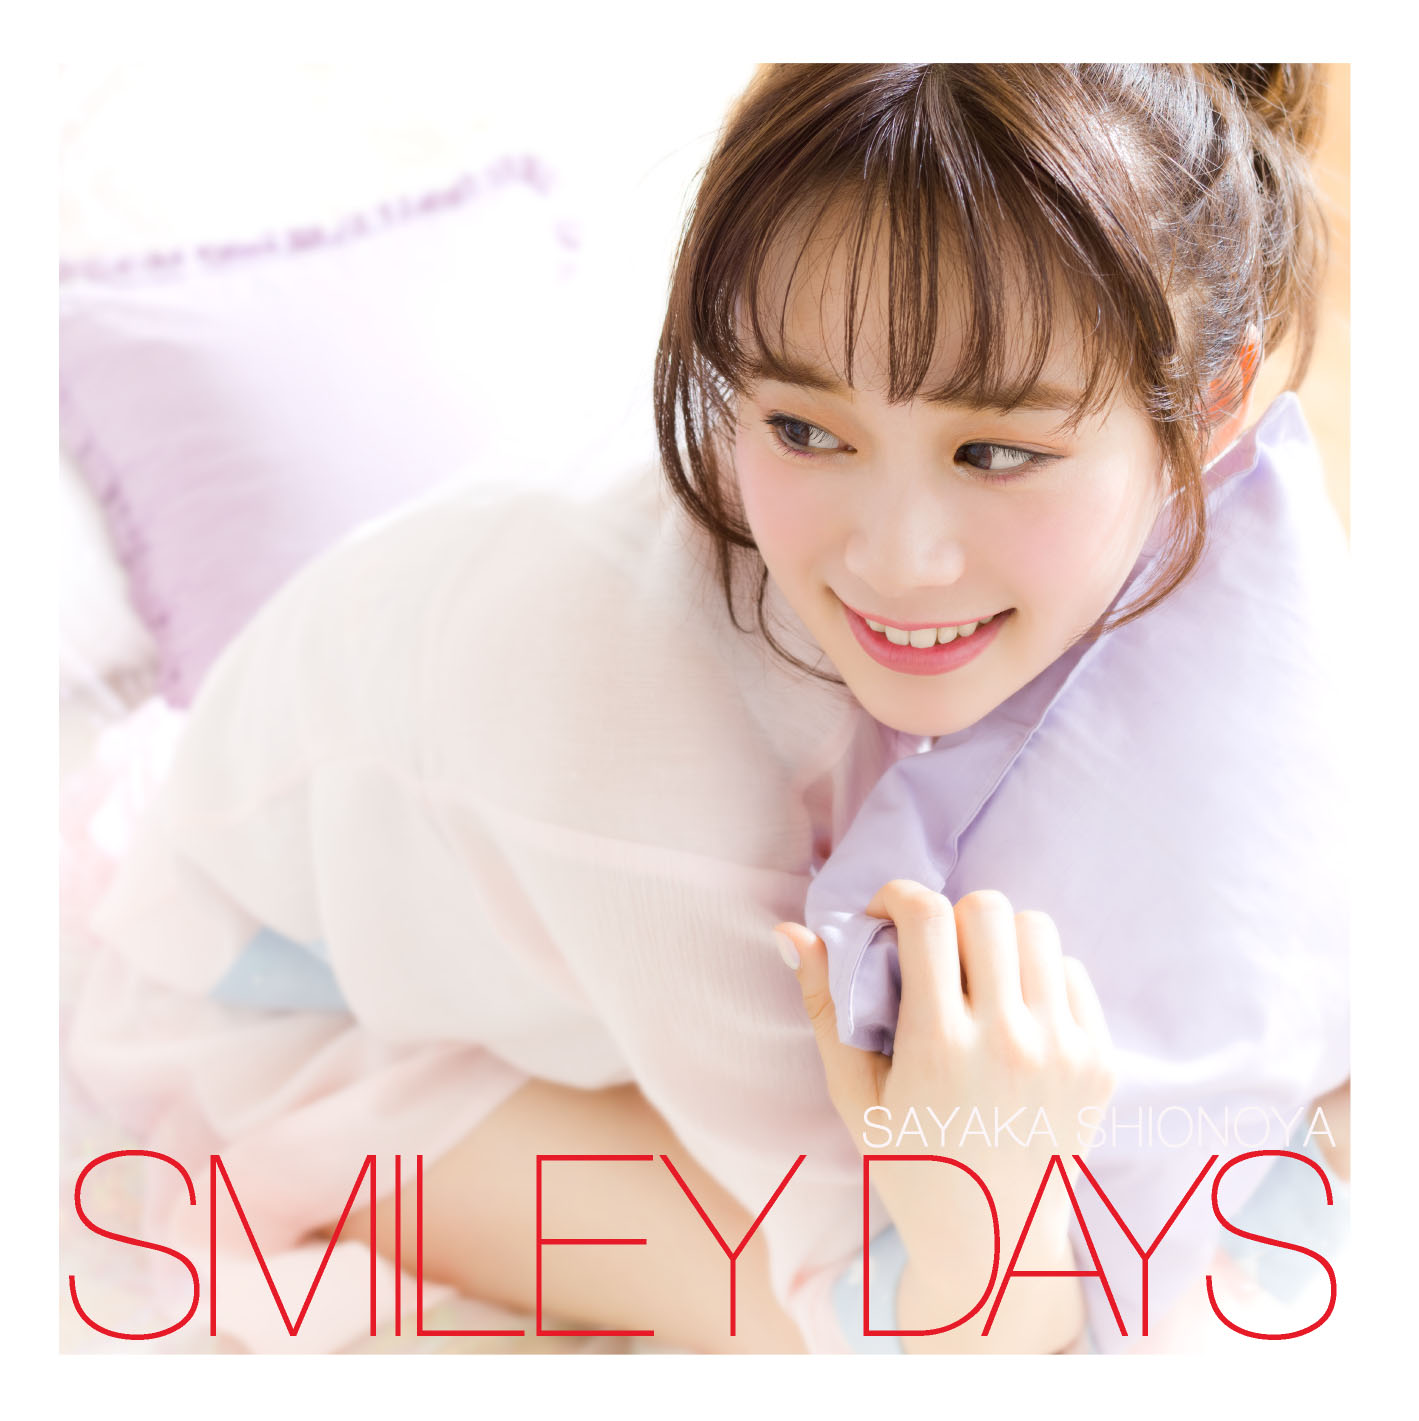 20160716.02.10 Sayaka Shionoya - Smiley days (M4A) cover.jpg